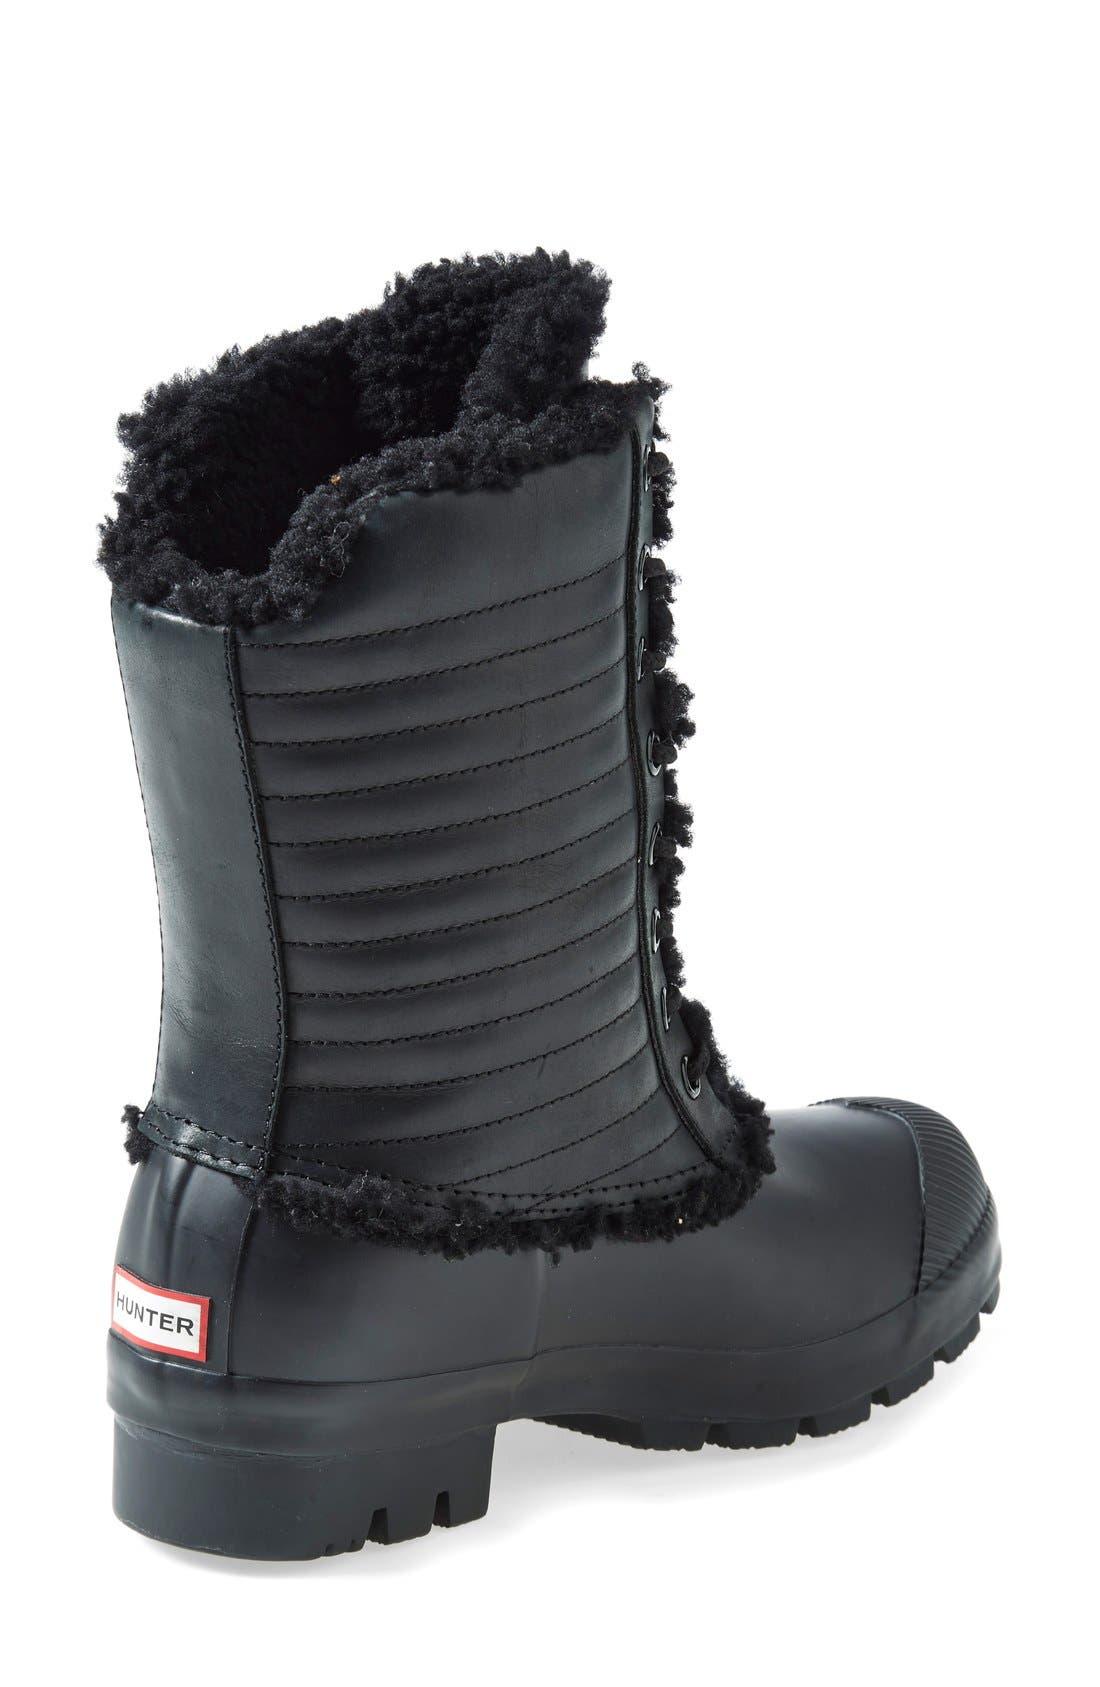 Alternate Image 2  - Hunter Original Genuine Shearling & Patent Leather Lace-Up Rain Boot (Women)